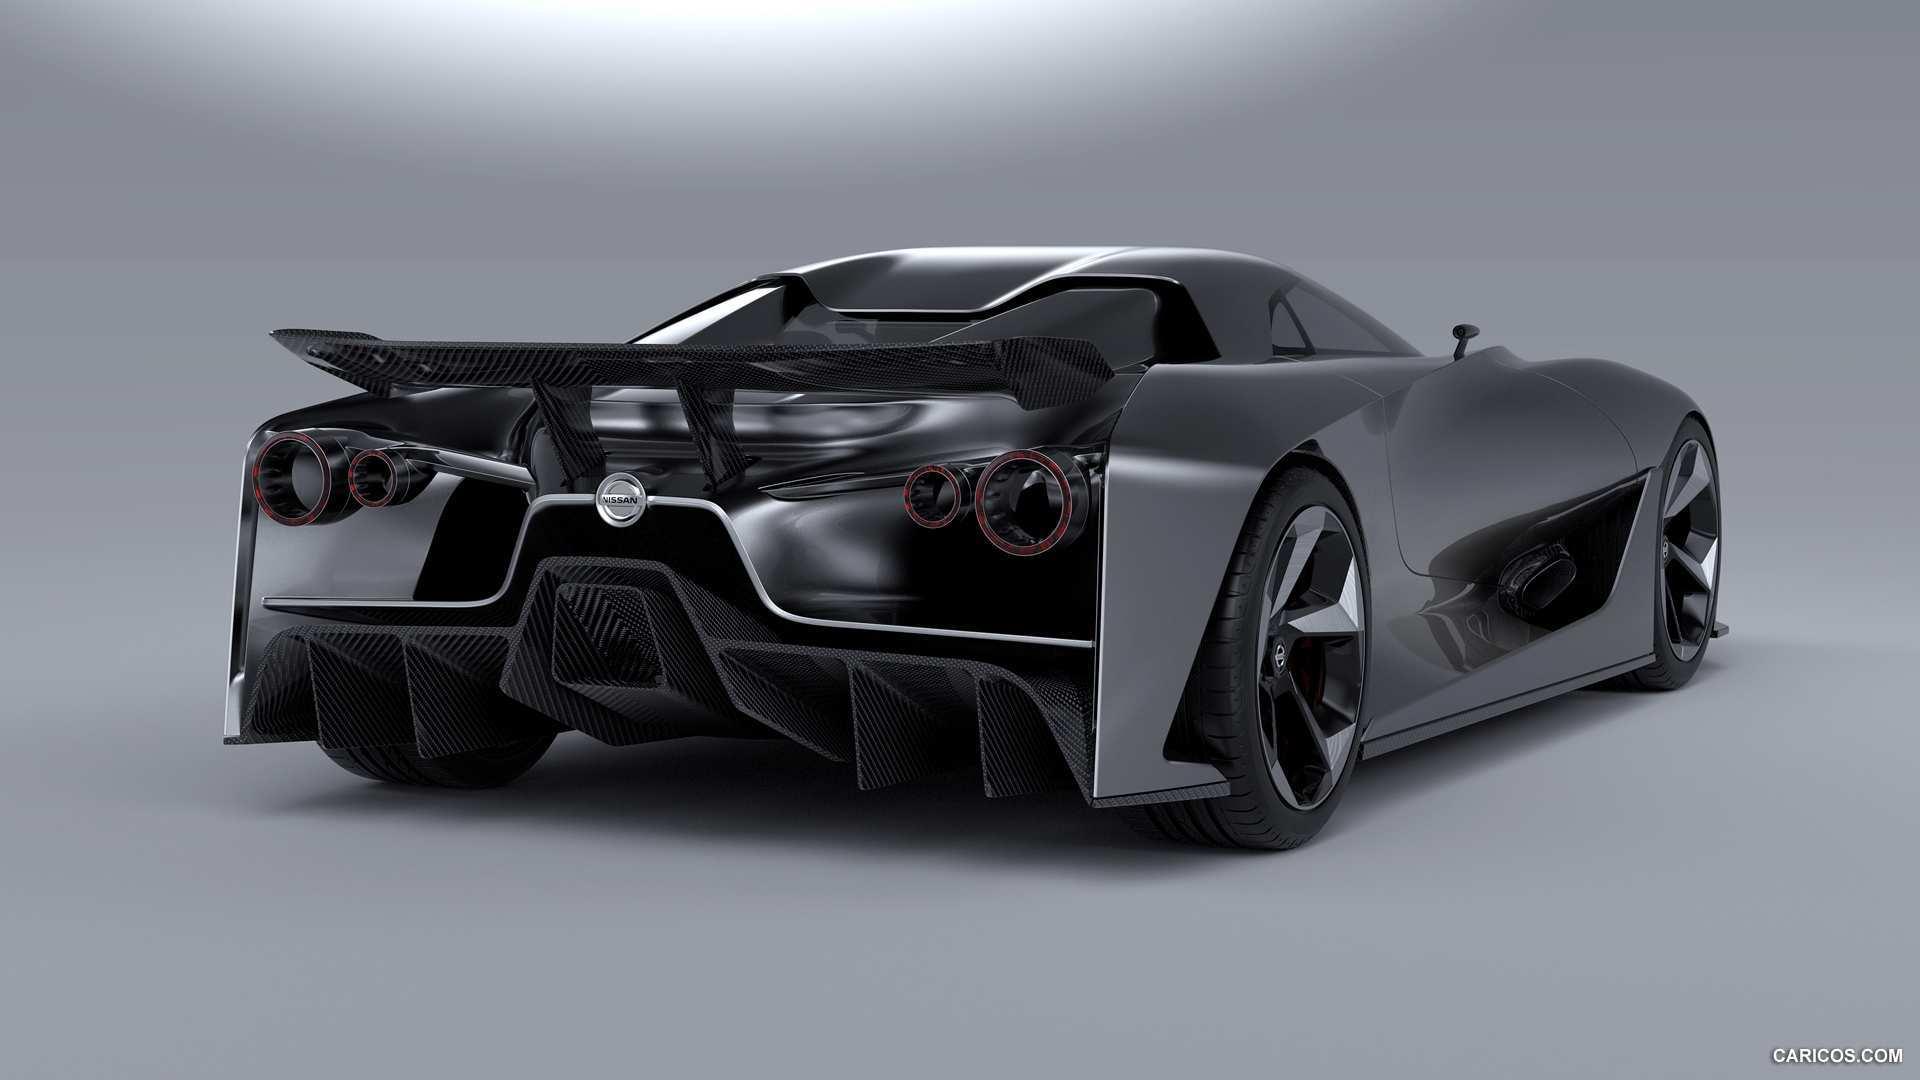 66 New 2020 Nissan Vision Gran Turismo New Concept with 2020 Nissan Vision Gran Turismo